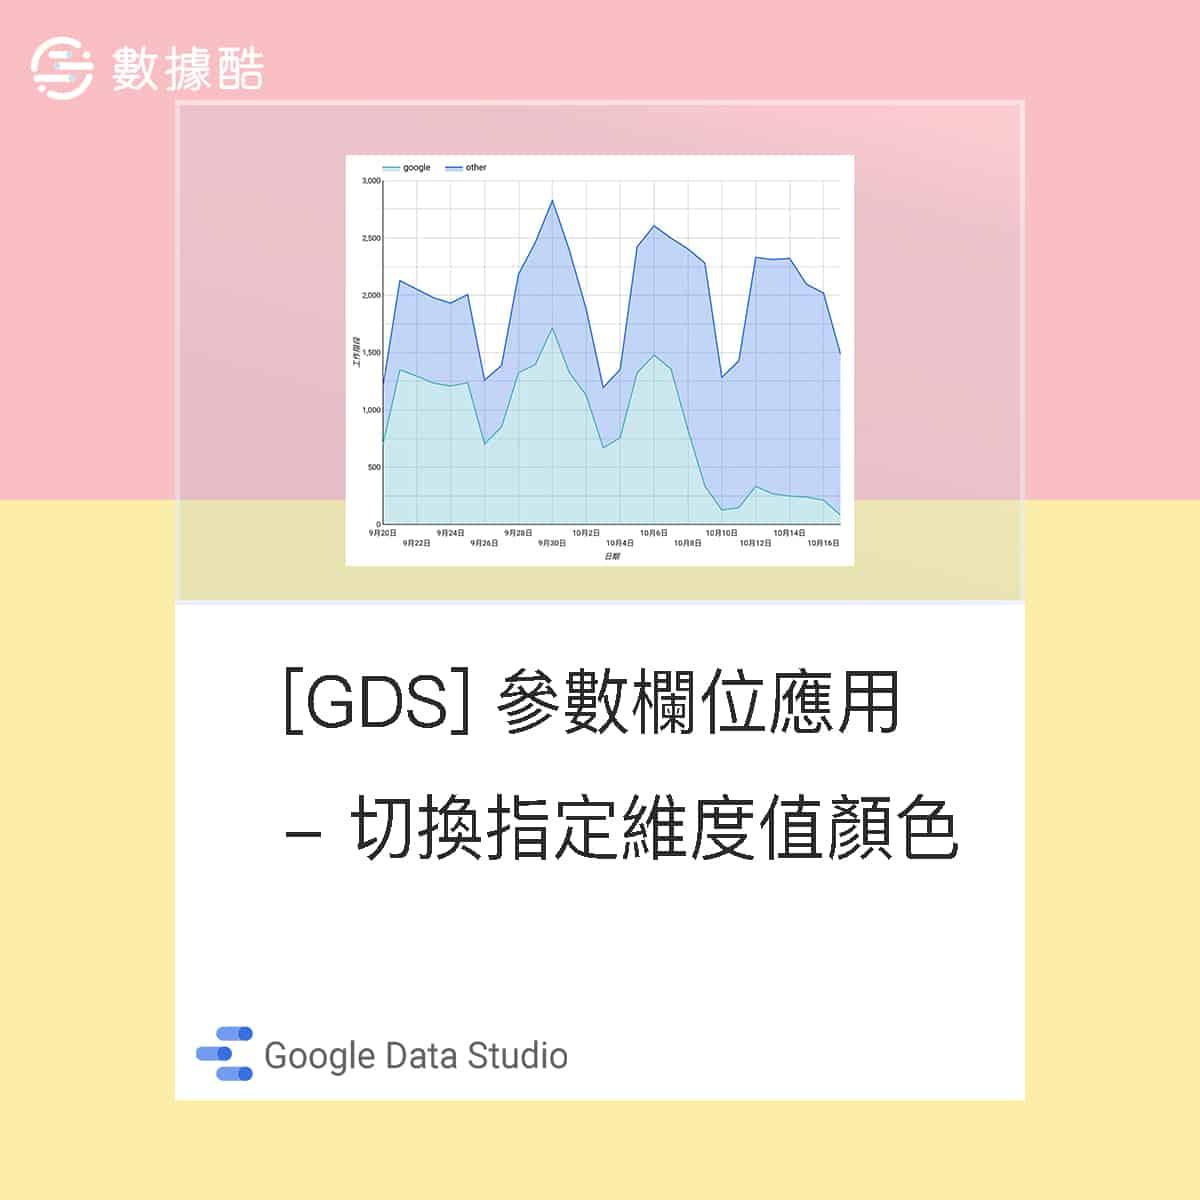 Google Data Studio 參數欄位應用 - 切換指定維度值顏色